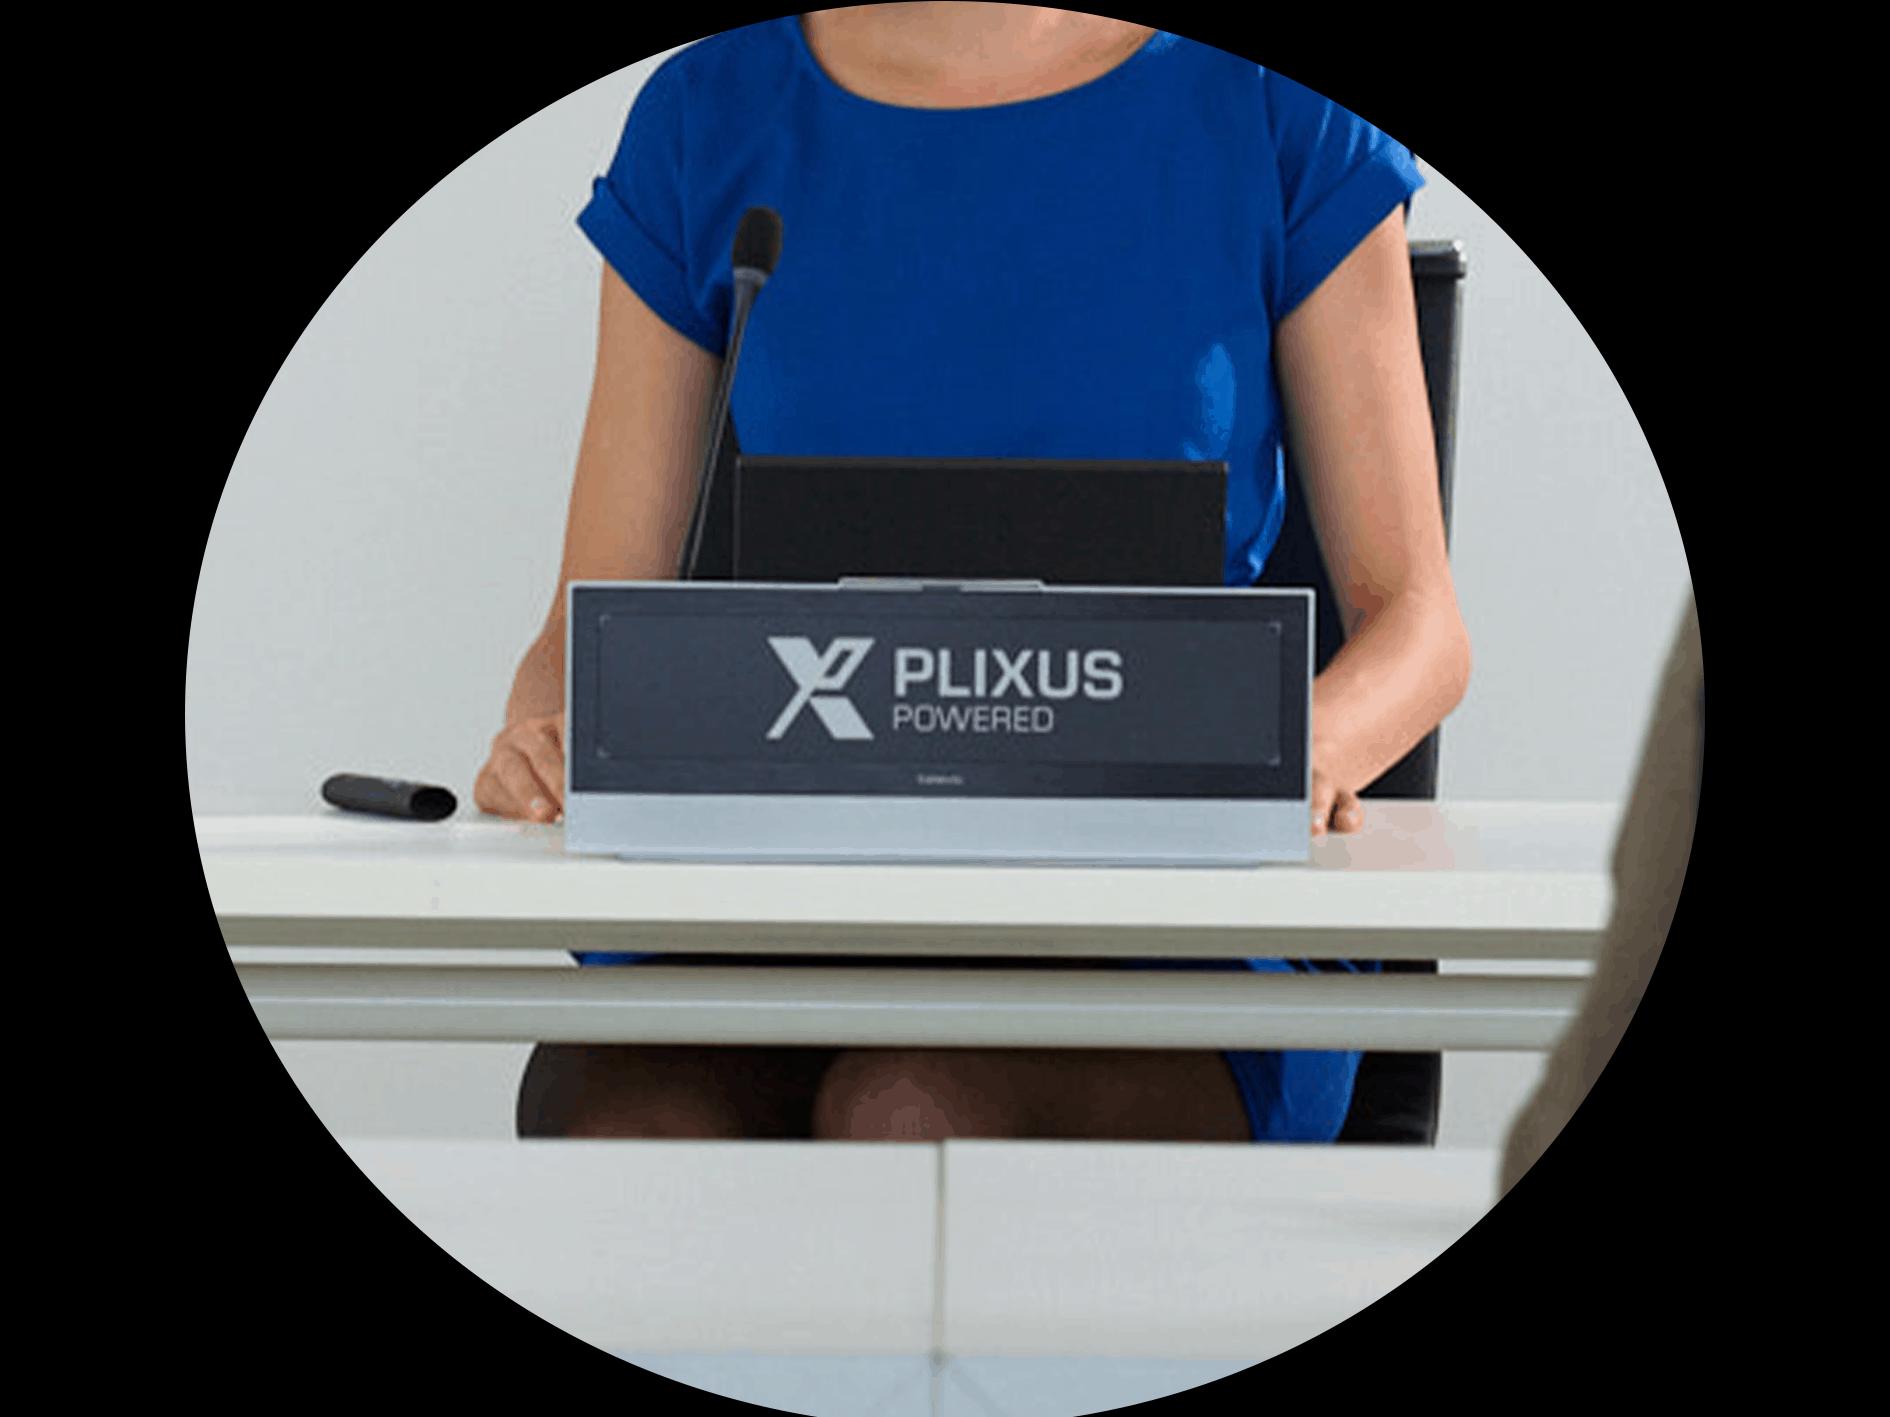 Plixus Nameplate - Televic Conference